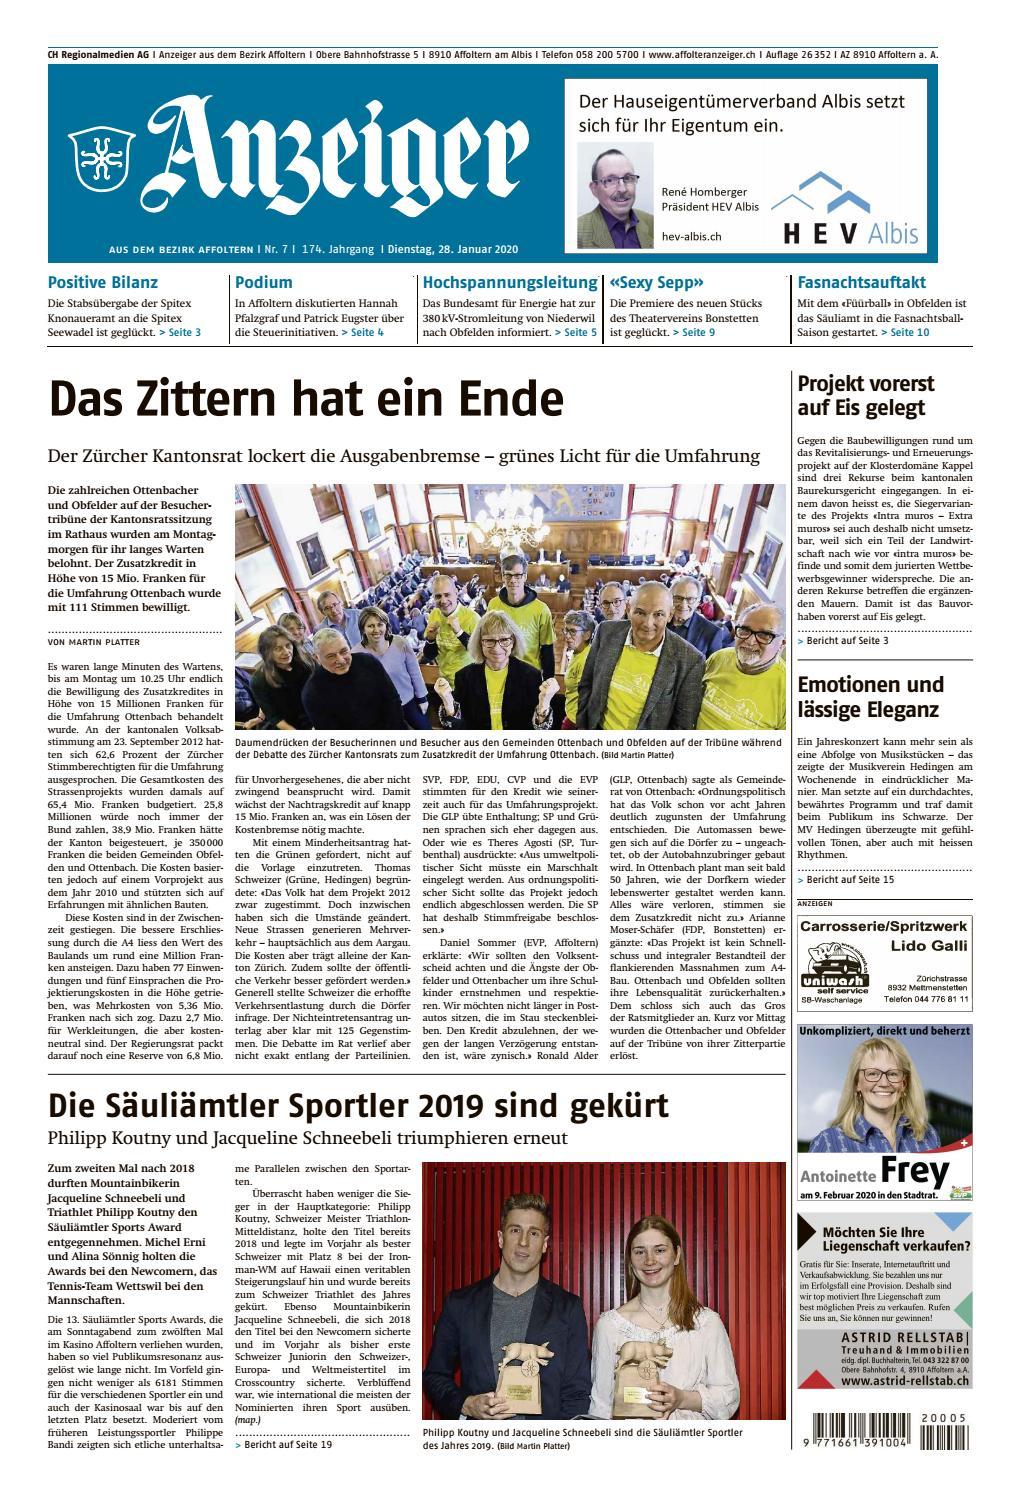 Hort-Jobs in Merenschwand, AG - Januar 2020 | dwellforward.org